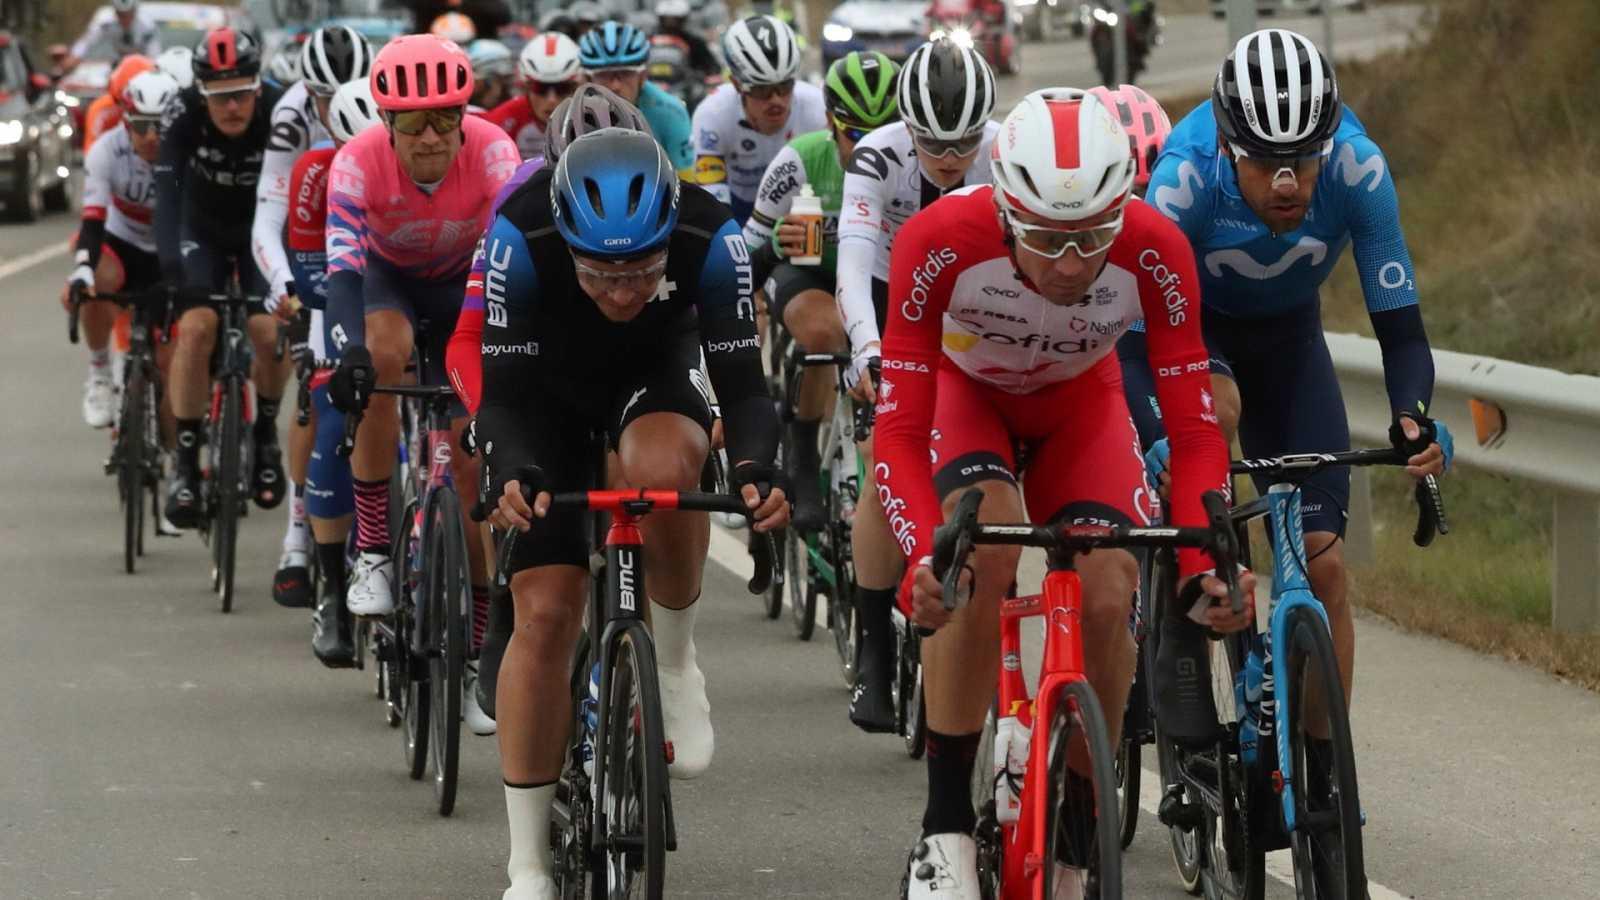 Vuelta ciclista a España 2020 - 6ª etapa: Biescas - Sallent de Gállego-Aramón Formigal (1) - ver ahora